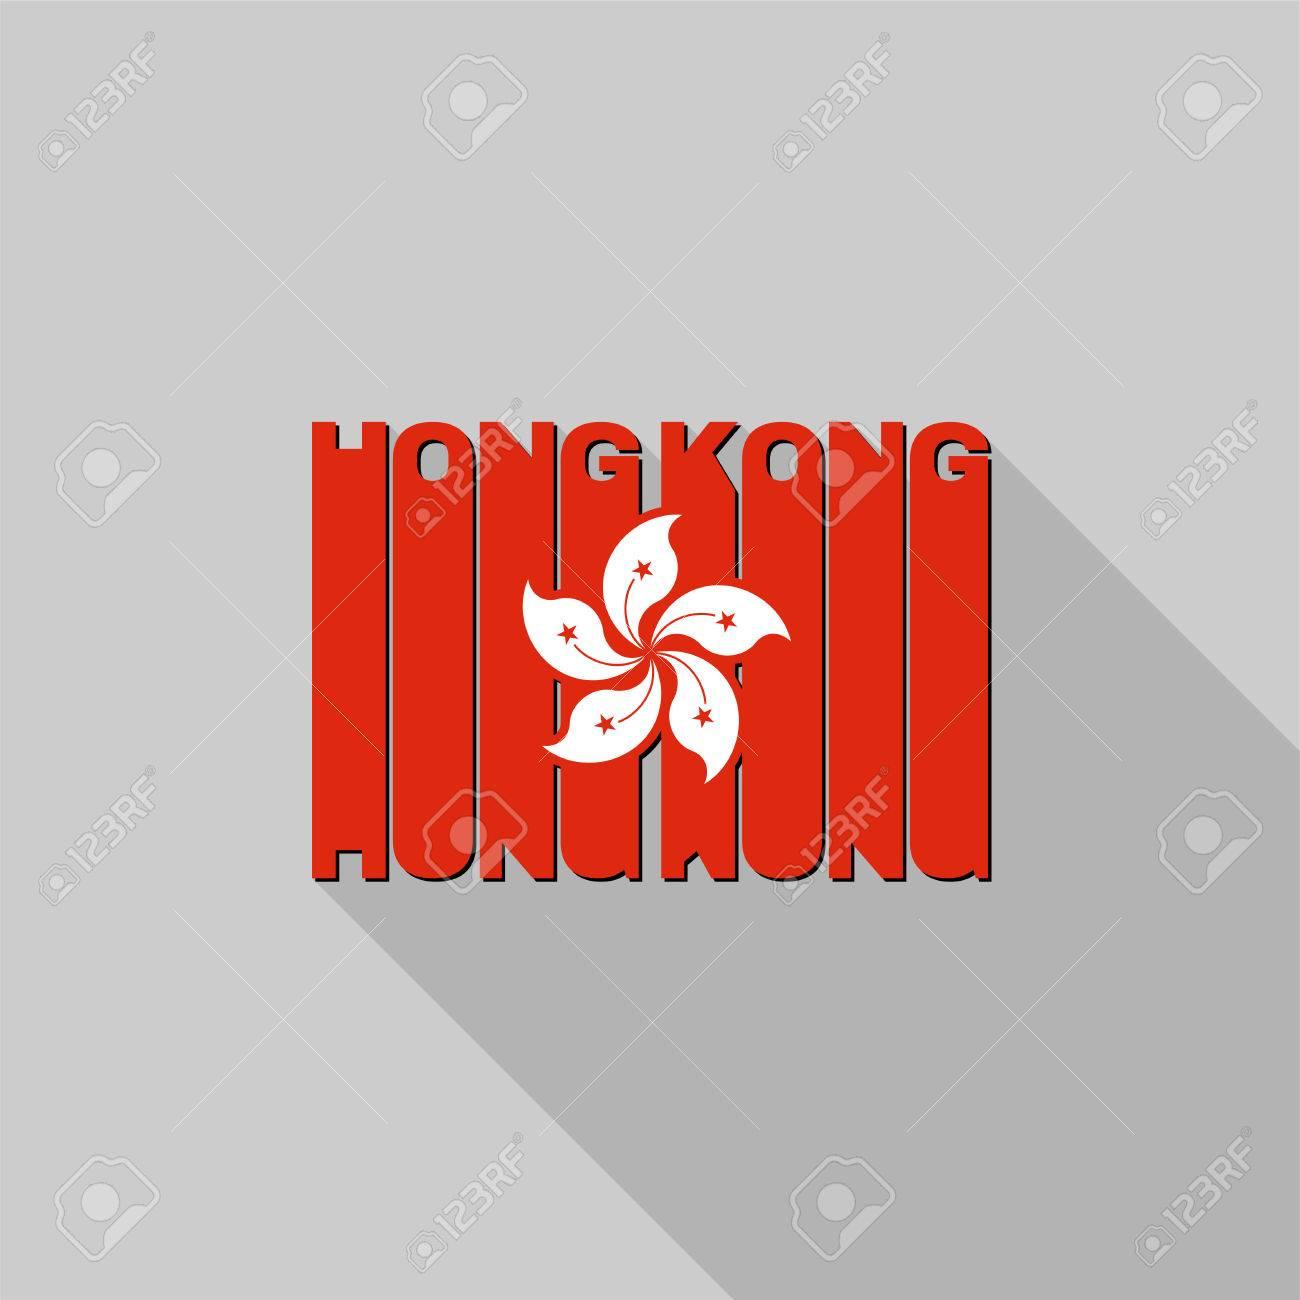 T shirt design hong kong - Hong Kong Flag Of The Letters Typography T Shirt Graphics Flat Design